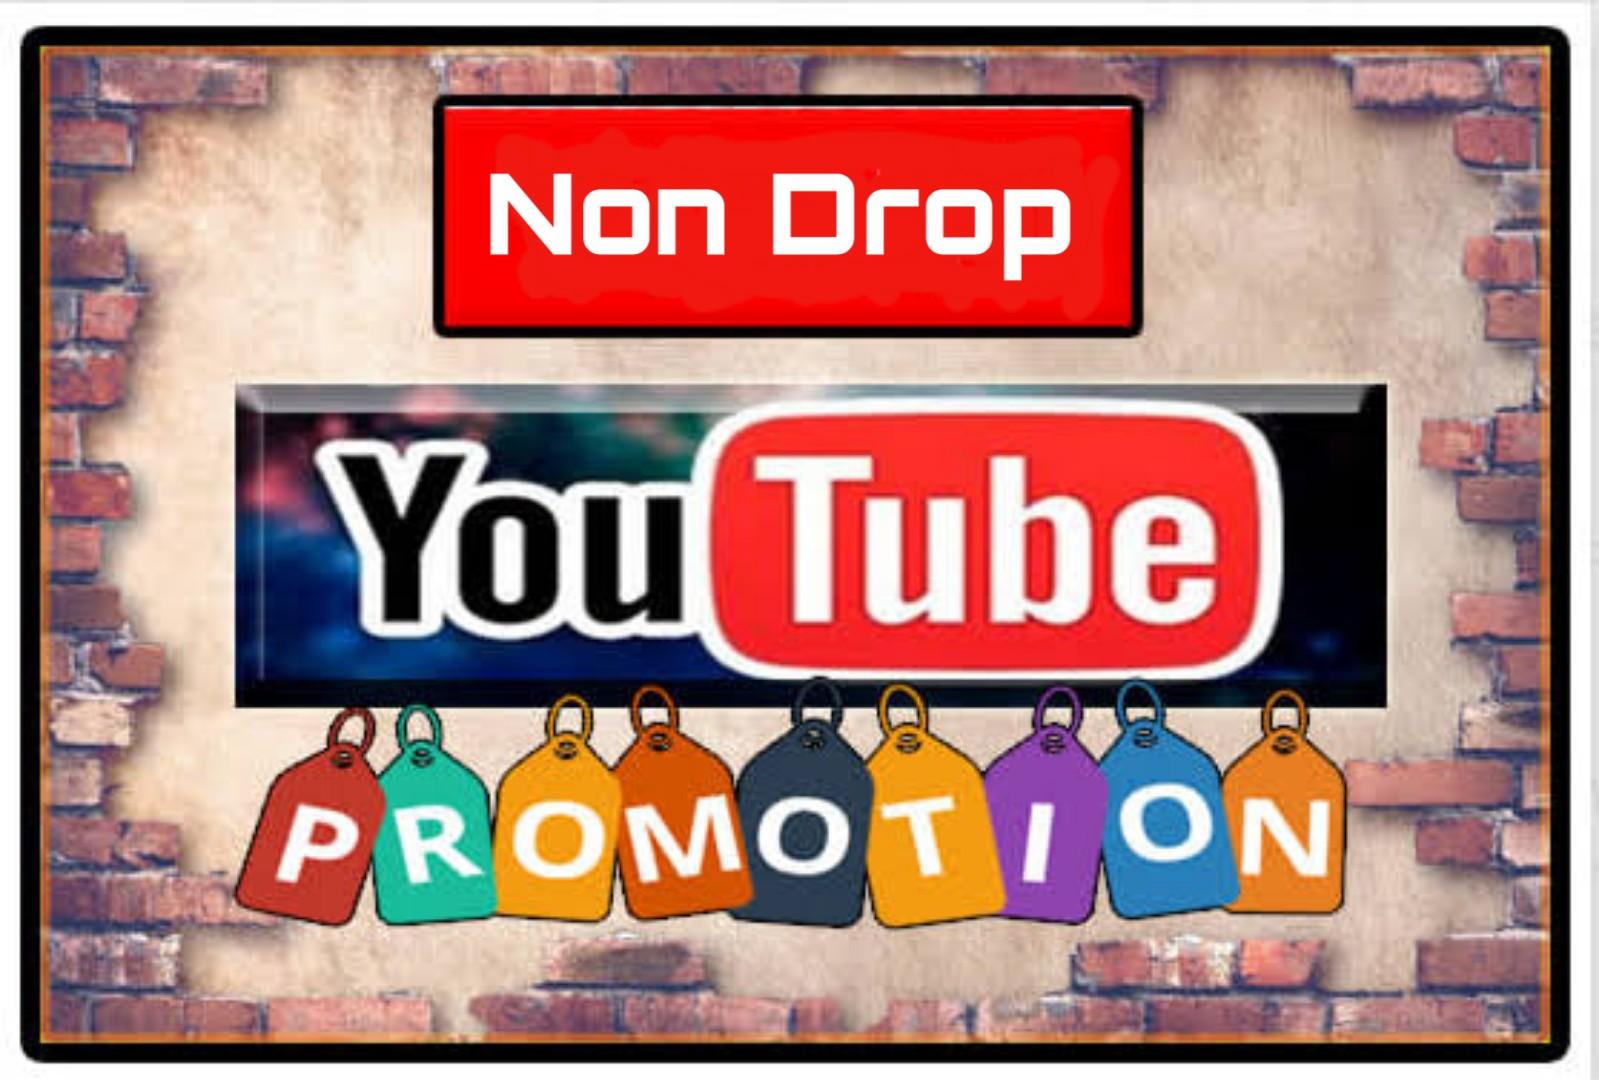 You tube Marketing Video Promotion Life time Guaranteed